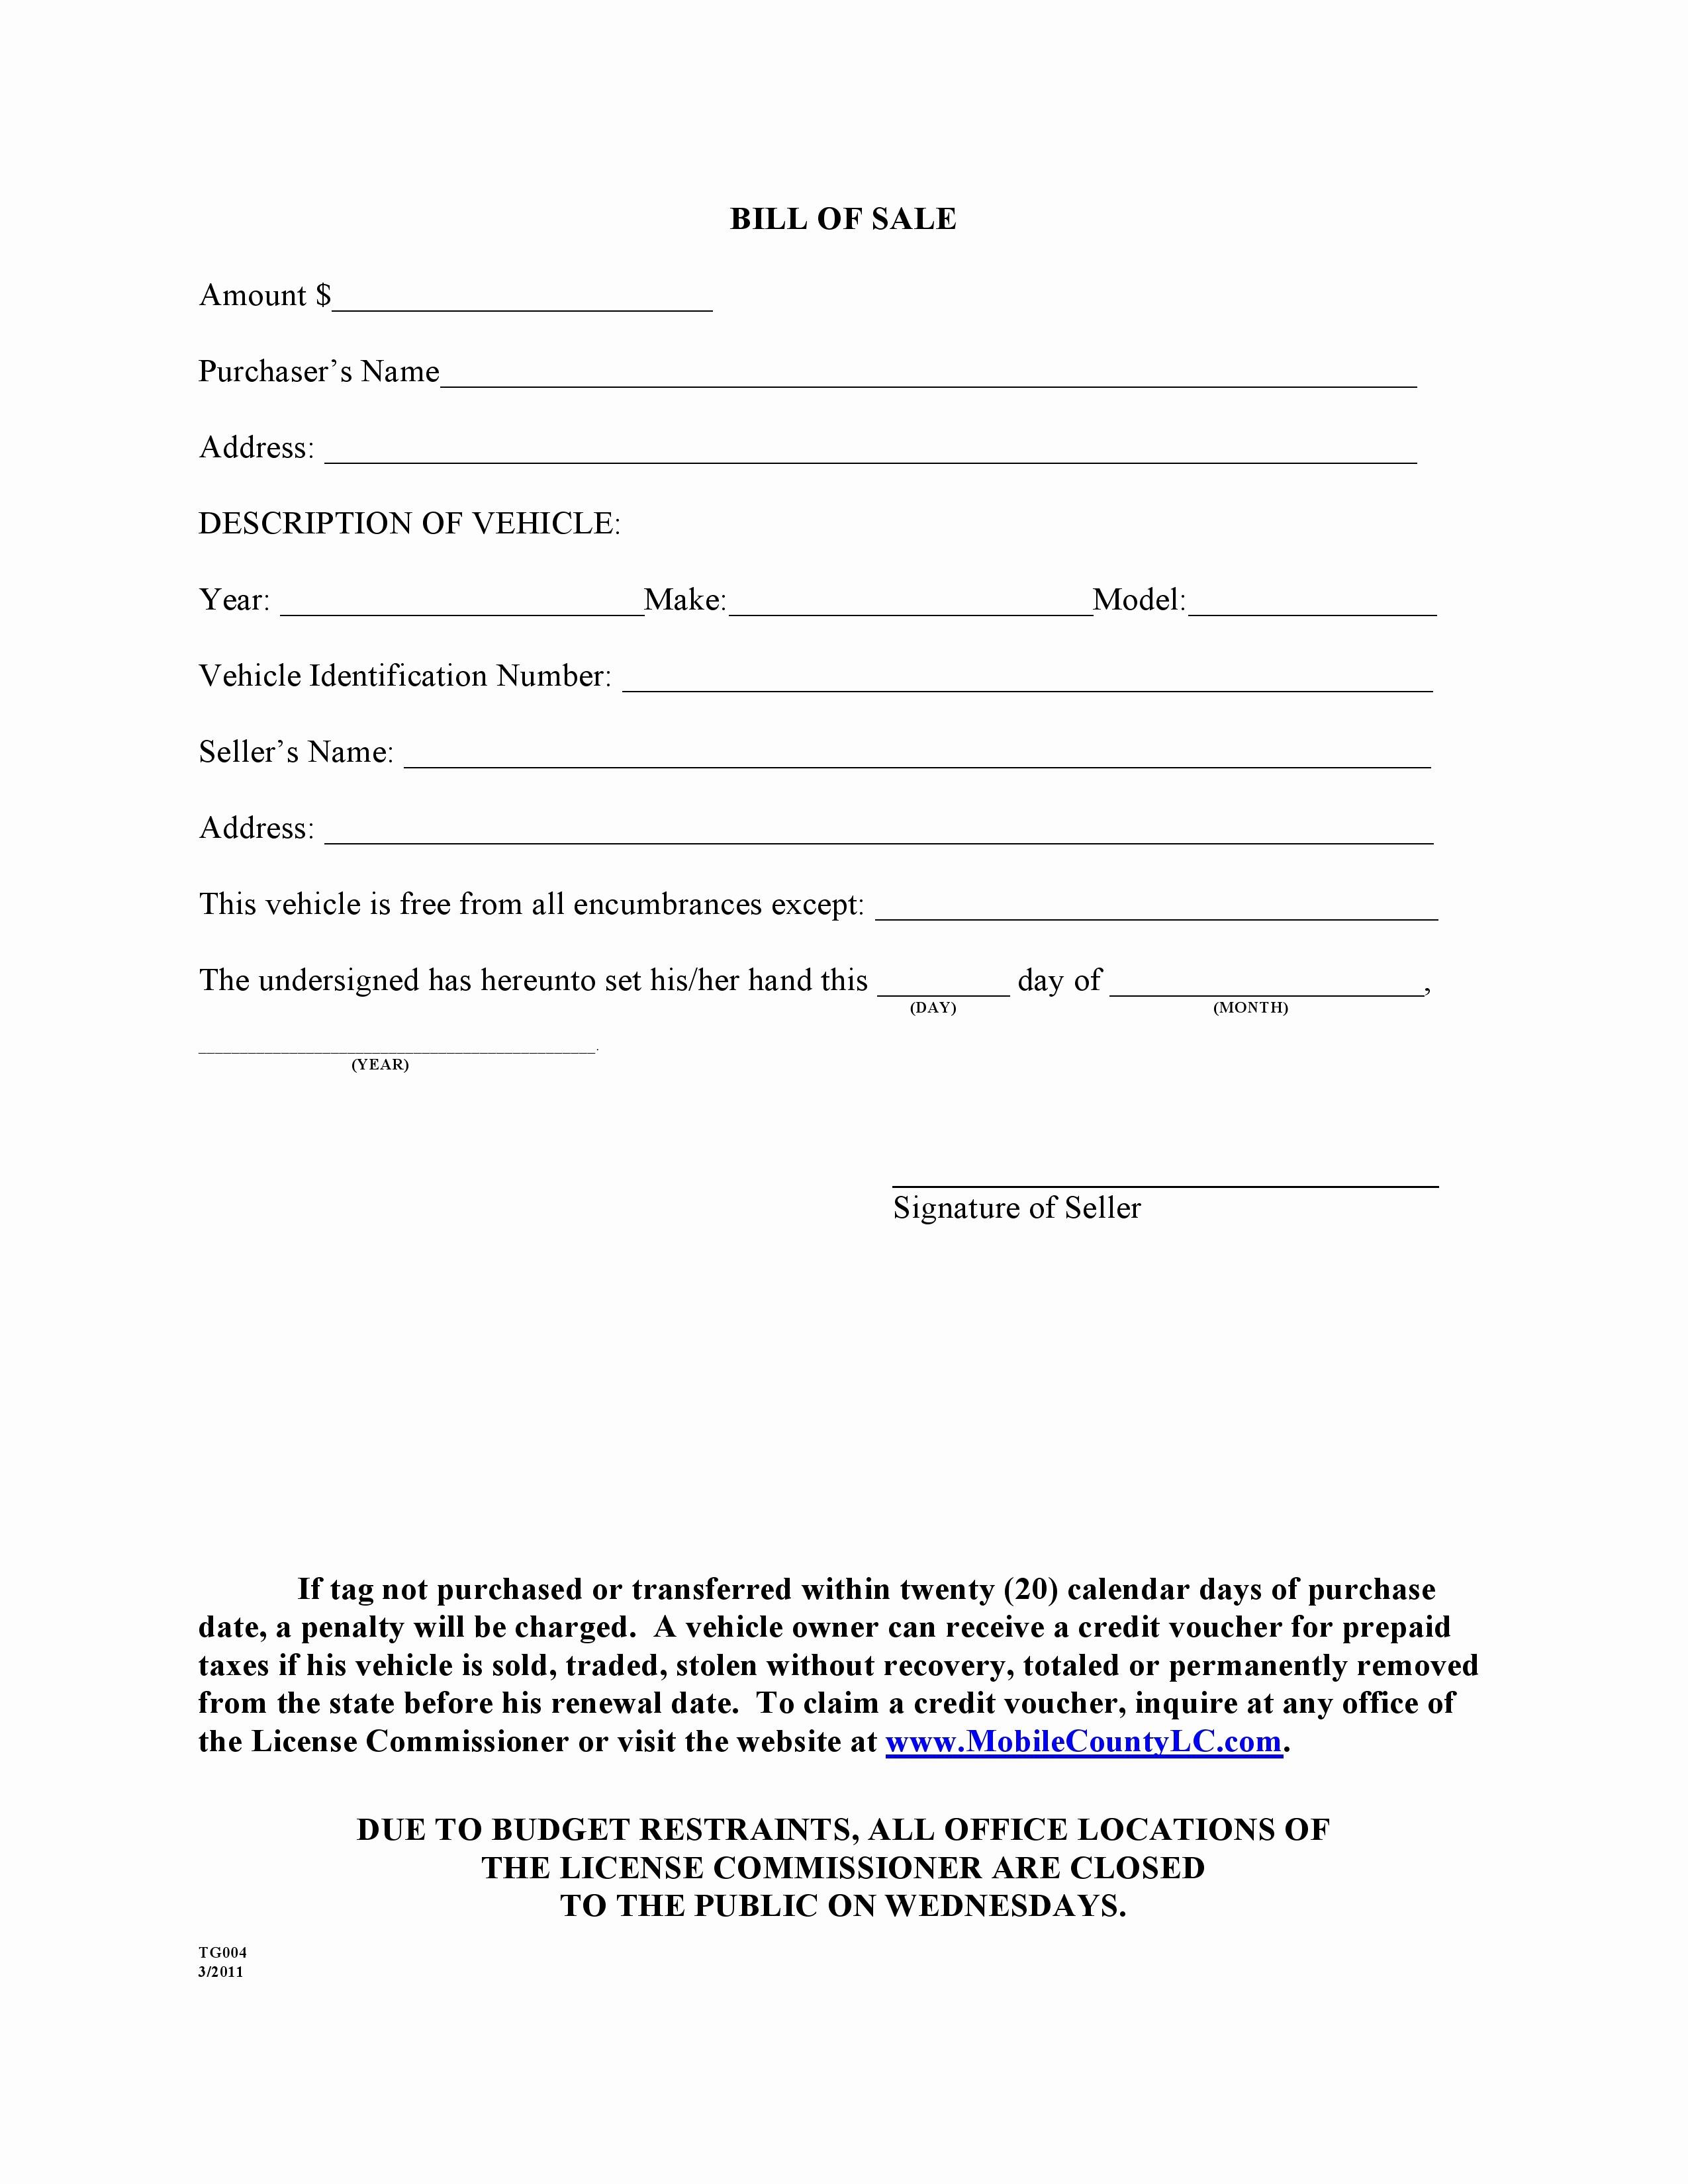 Bill Of Sale Sample Car Luxury Free Mobile County Alabama Bill Of Sale form Pdf